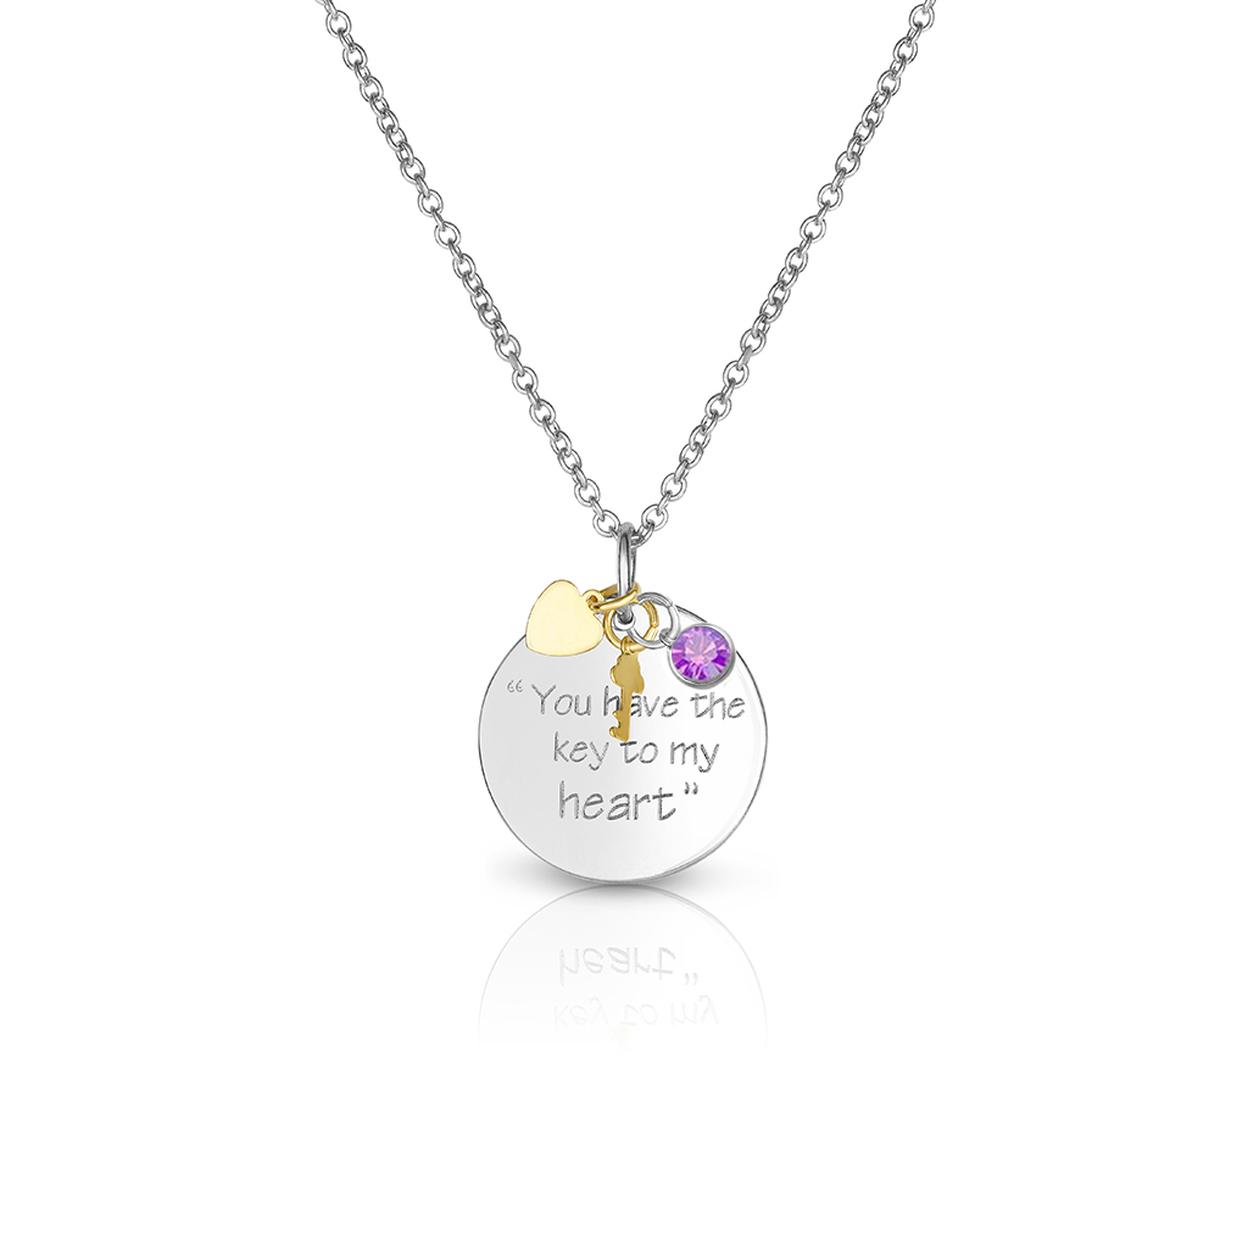 Light Amethyst June Swarovski Elements Crystal Birthstone Key To My Heart Necklace